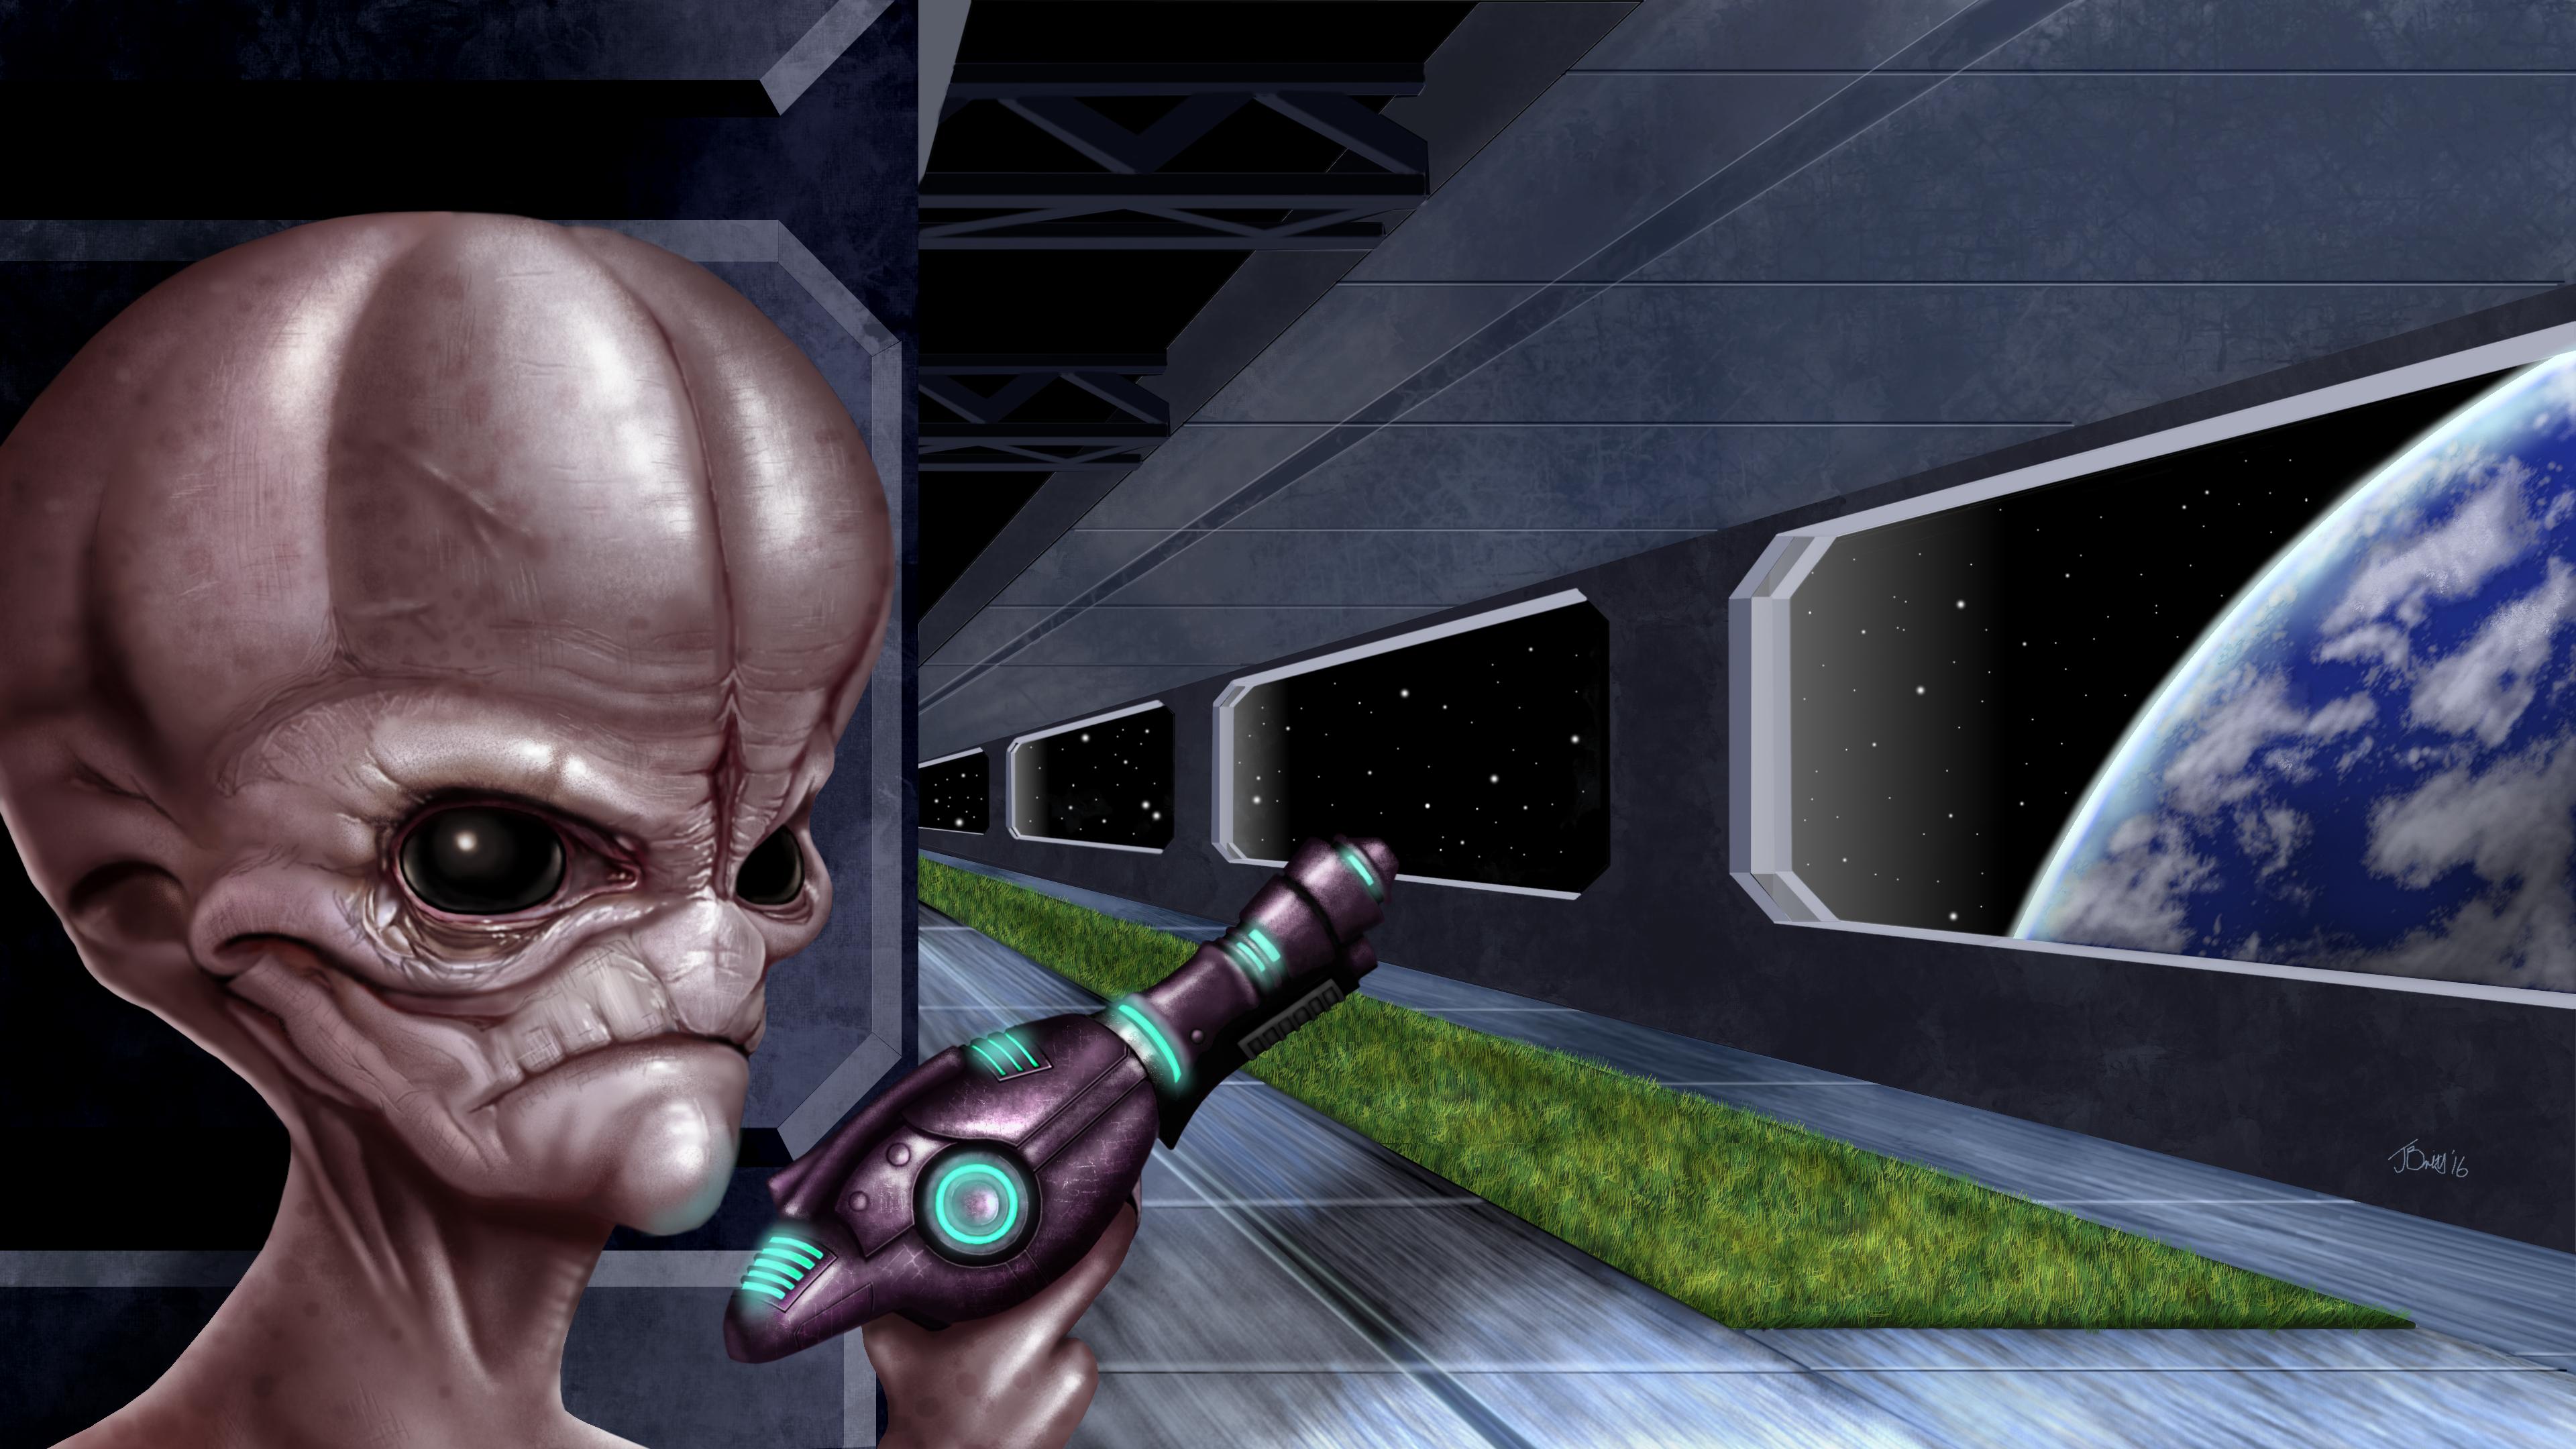 Extraterrestrial Killer